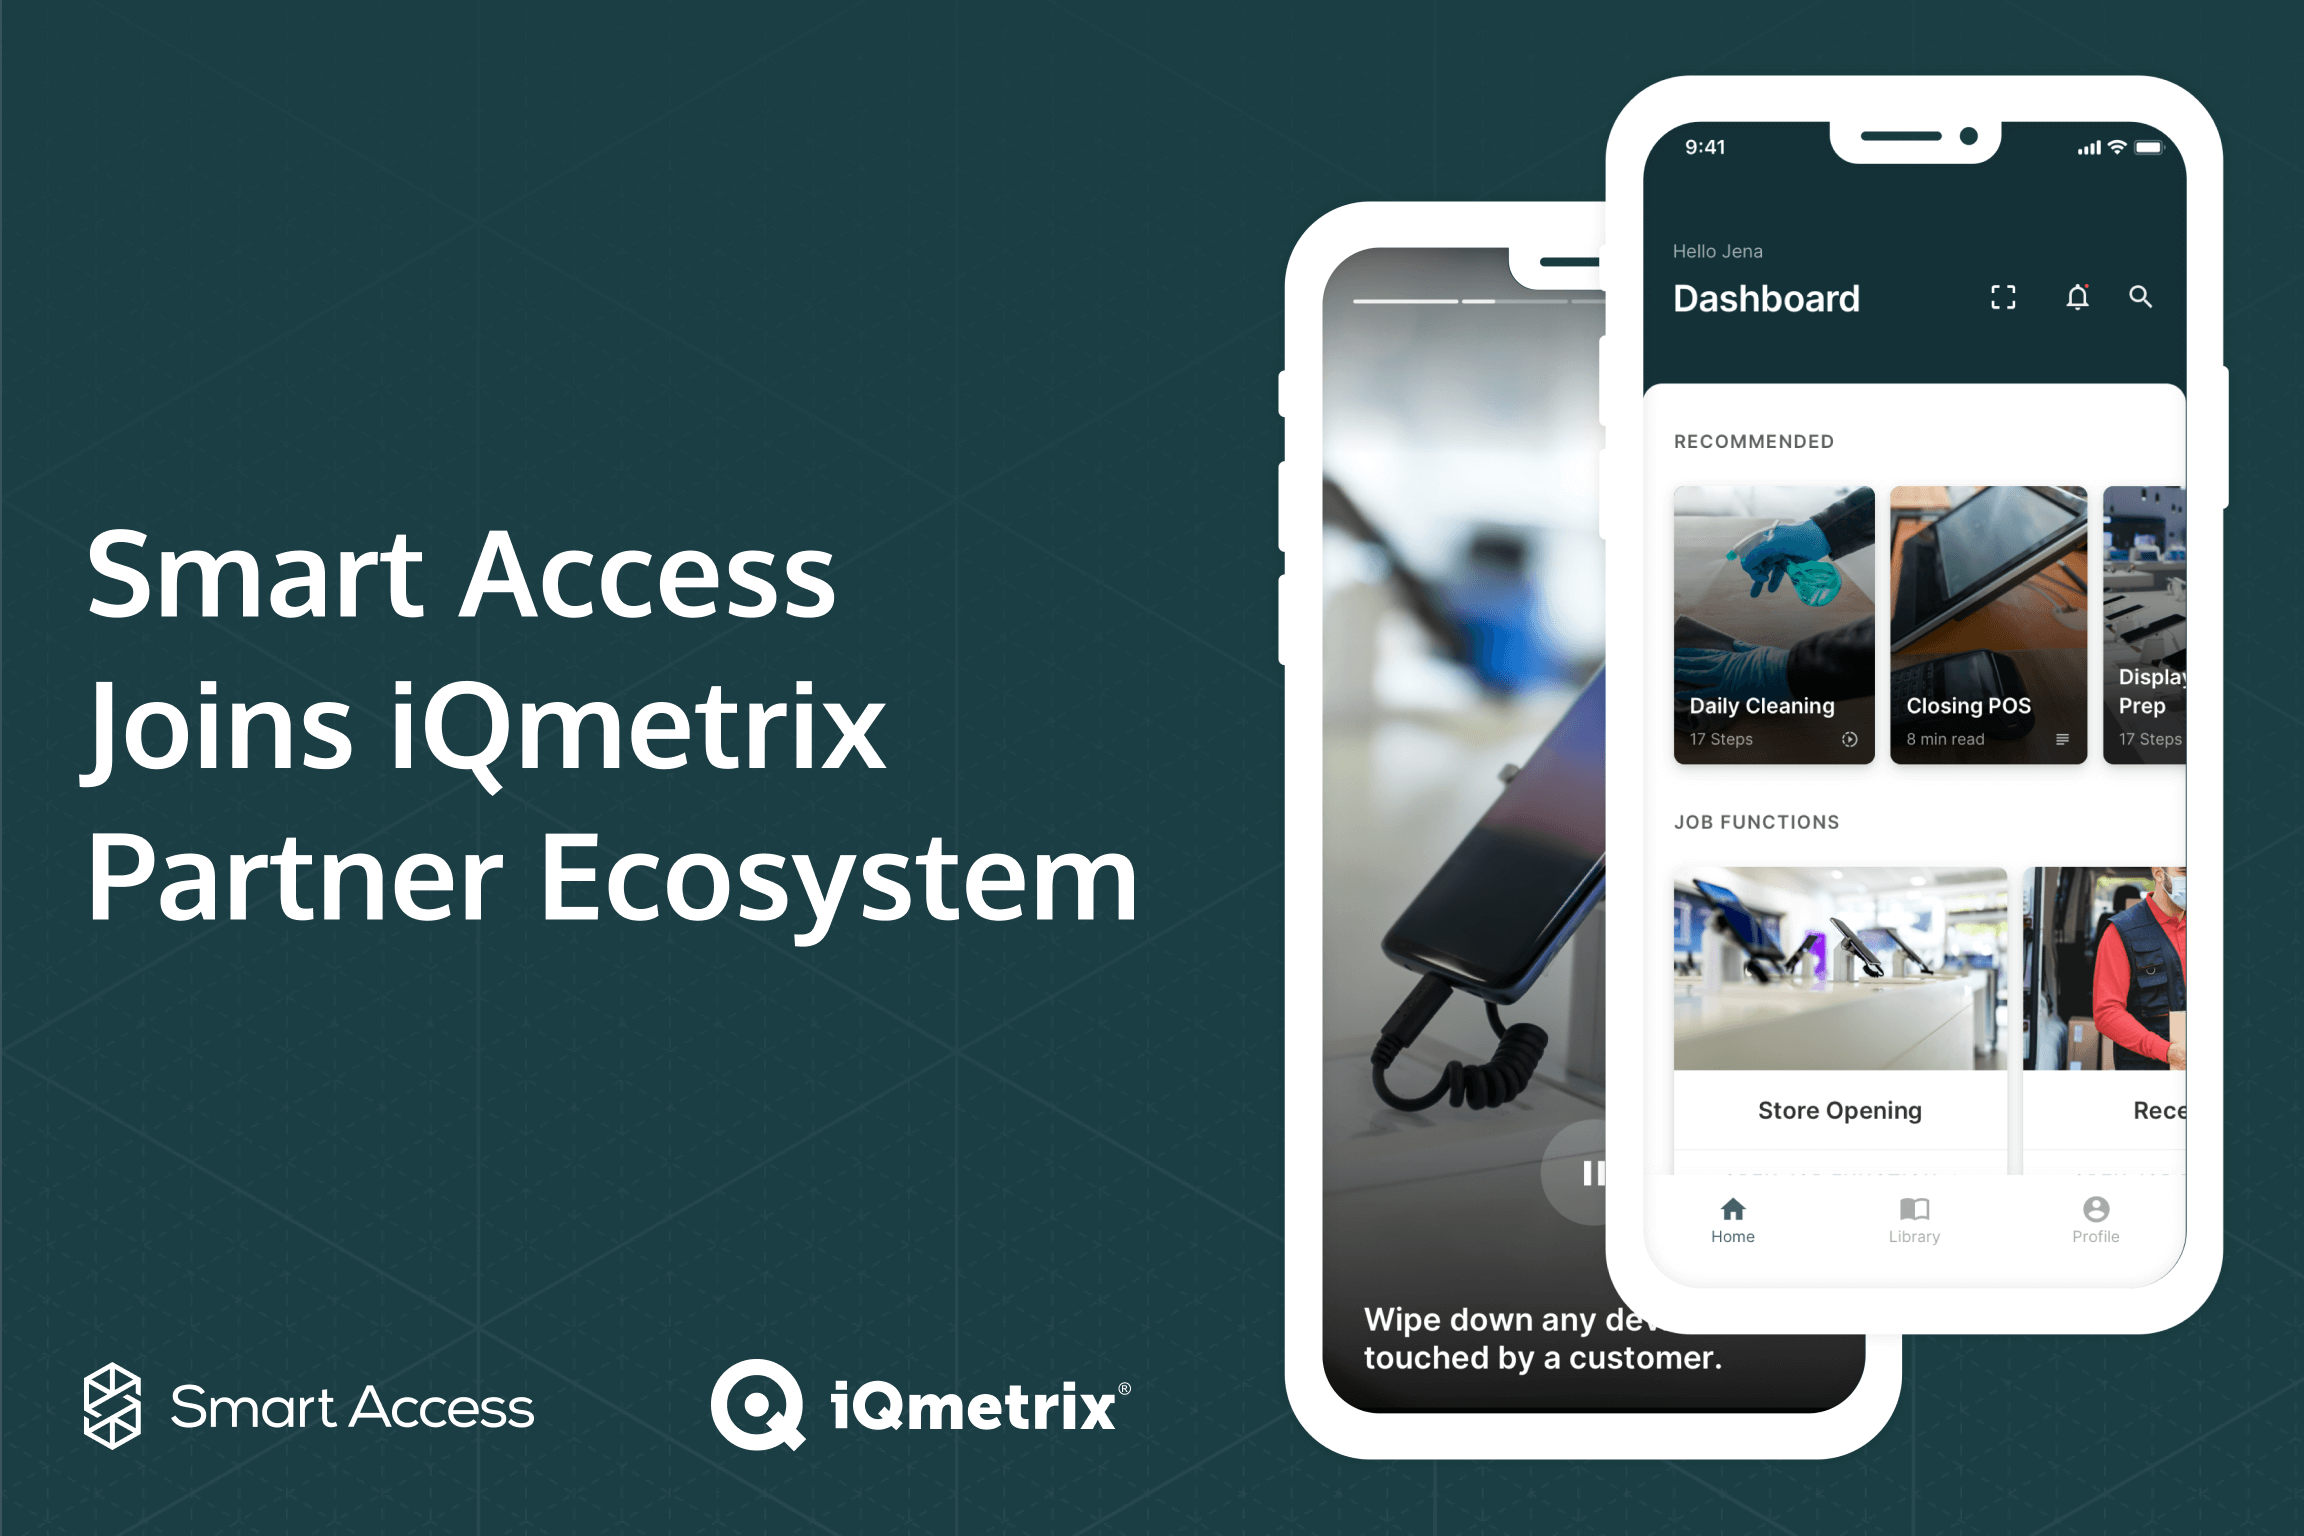 Smart Access iQmetrix partnership employee training